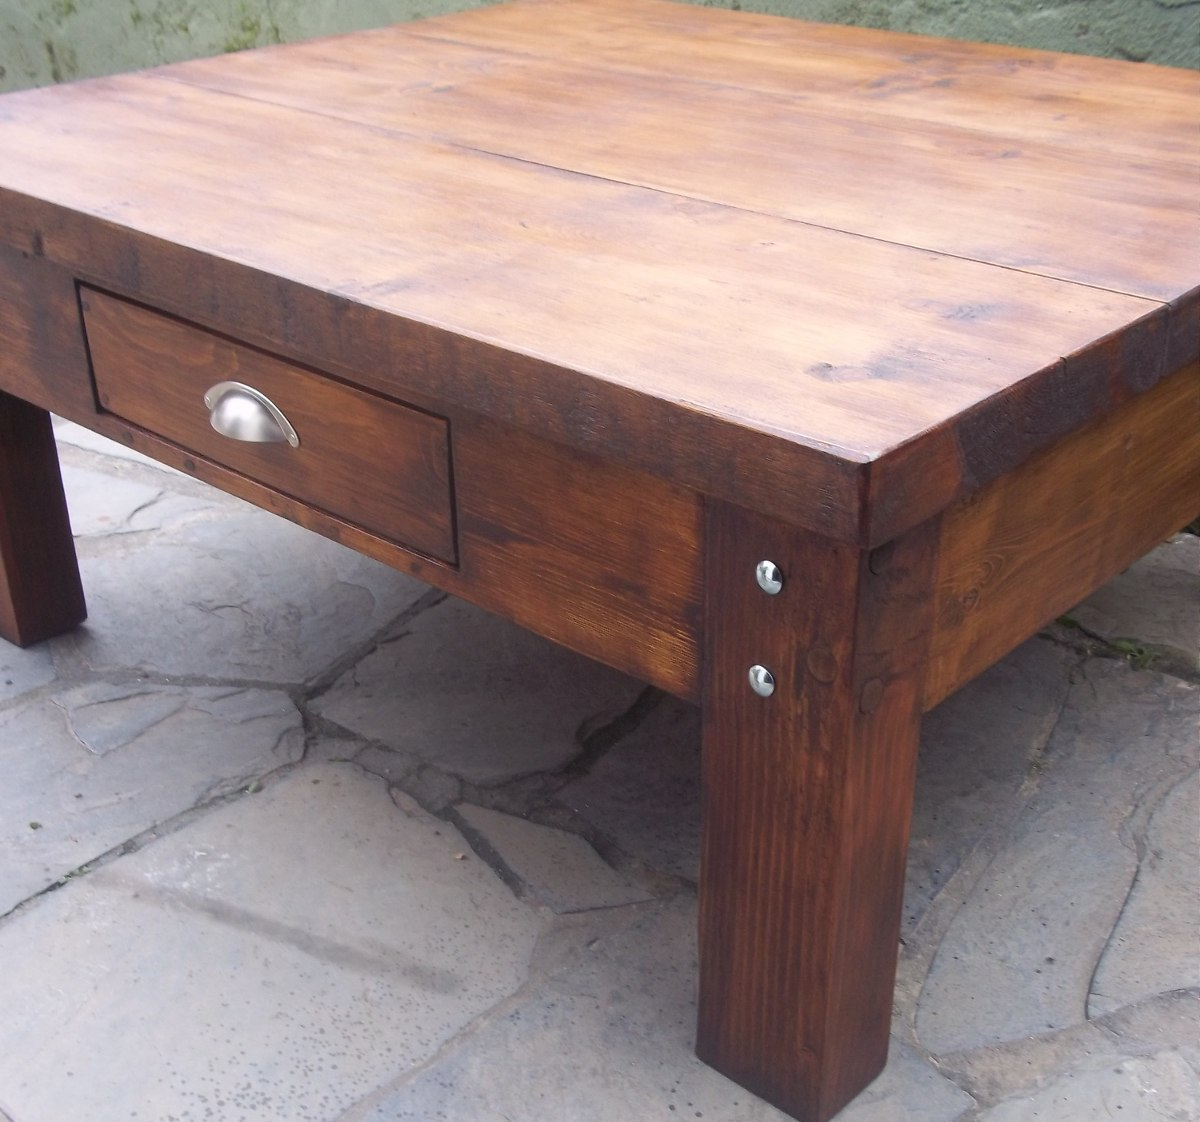 Mesa ratona madera r stica en mercado libre for Hacer mesa de madera rustica